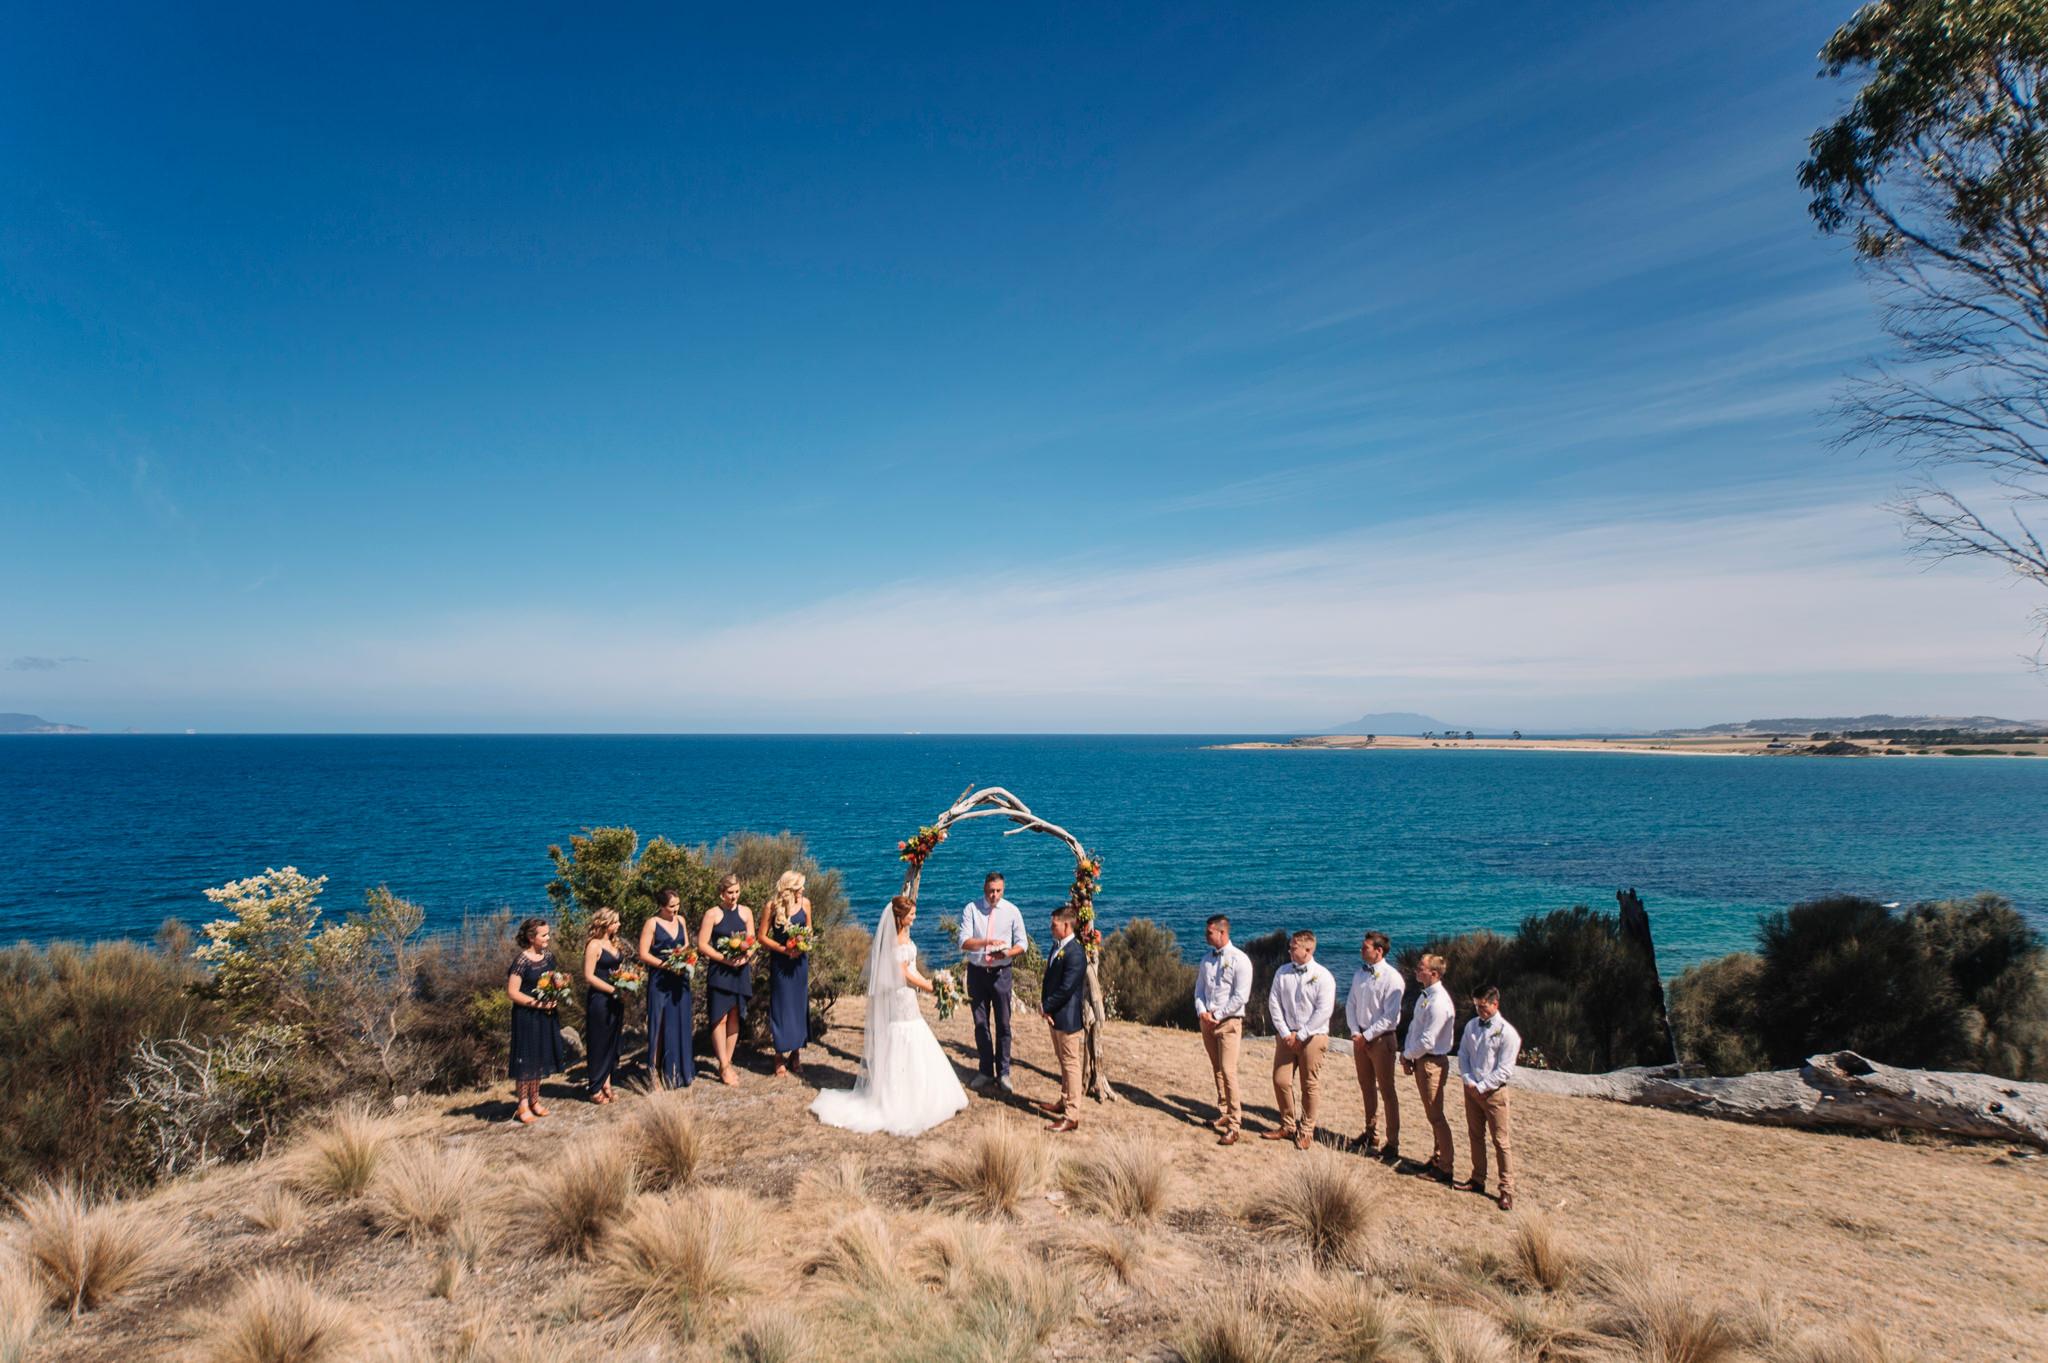 Wedding Ceremony under a driftwood arch at Avalon Coastal retreat